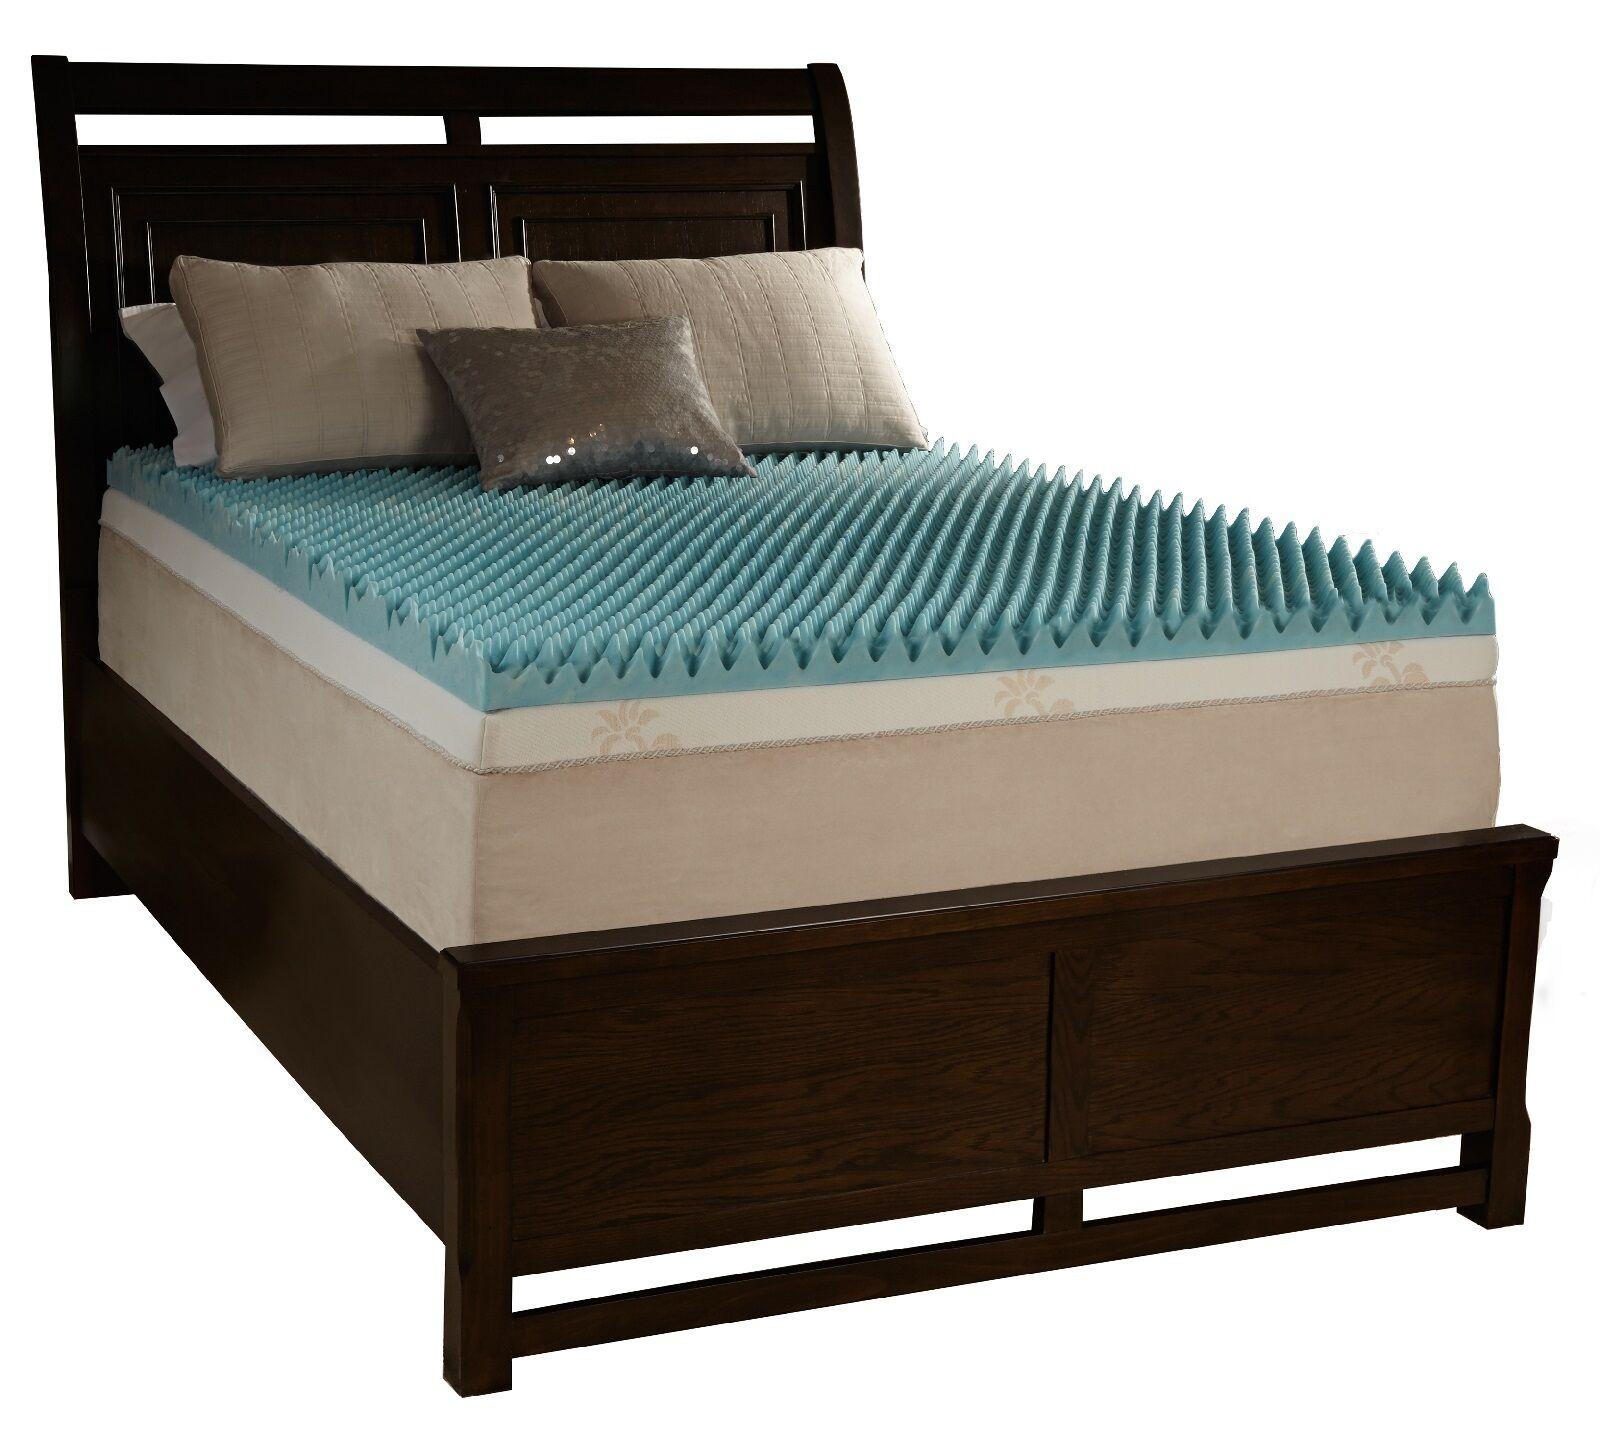 2  King Egg Crate Foam Mattress Topper Beautyrest Gel Memory Bed Cushion Pad